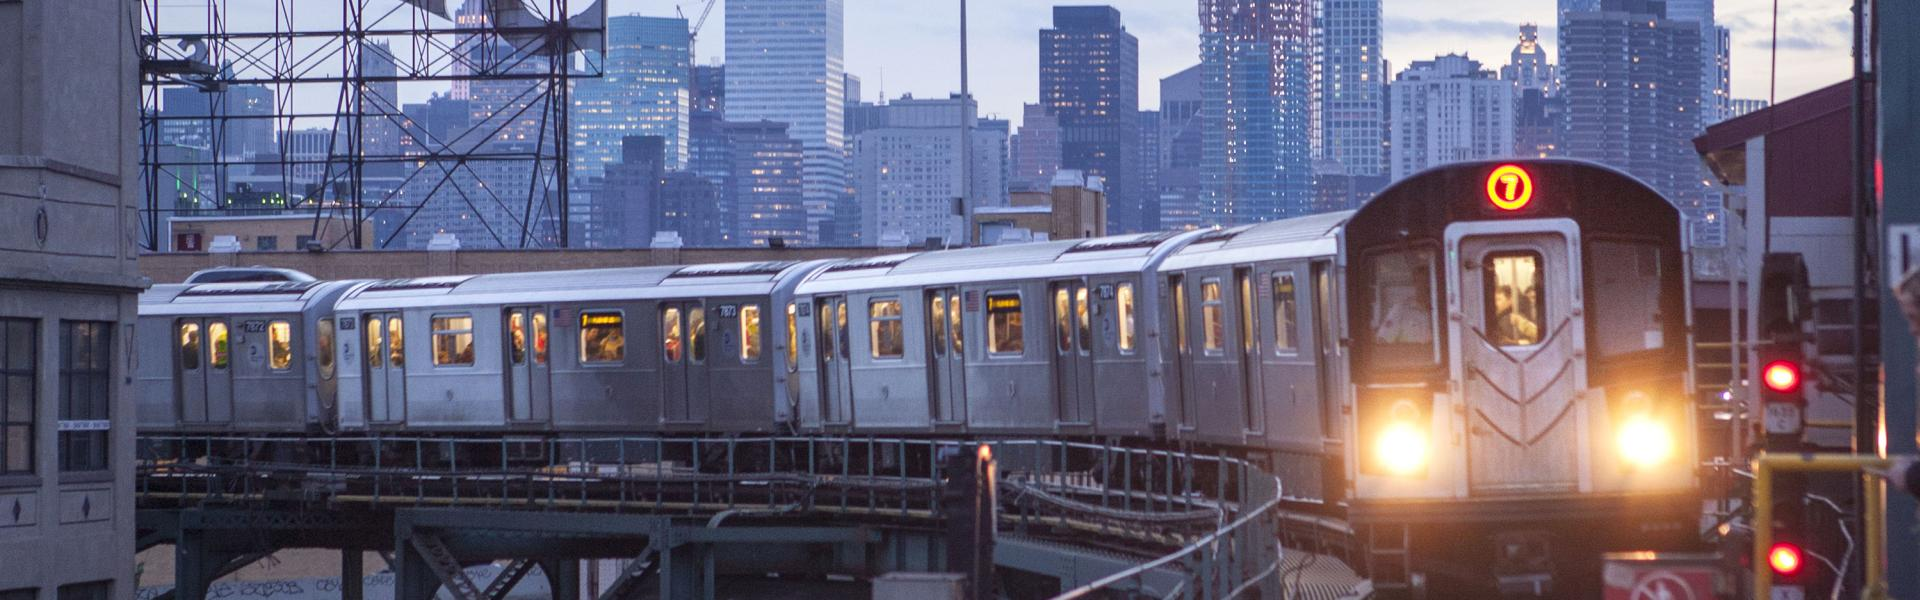 7 Train, Queens, Skyline, Dusk